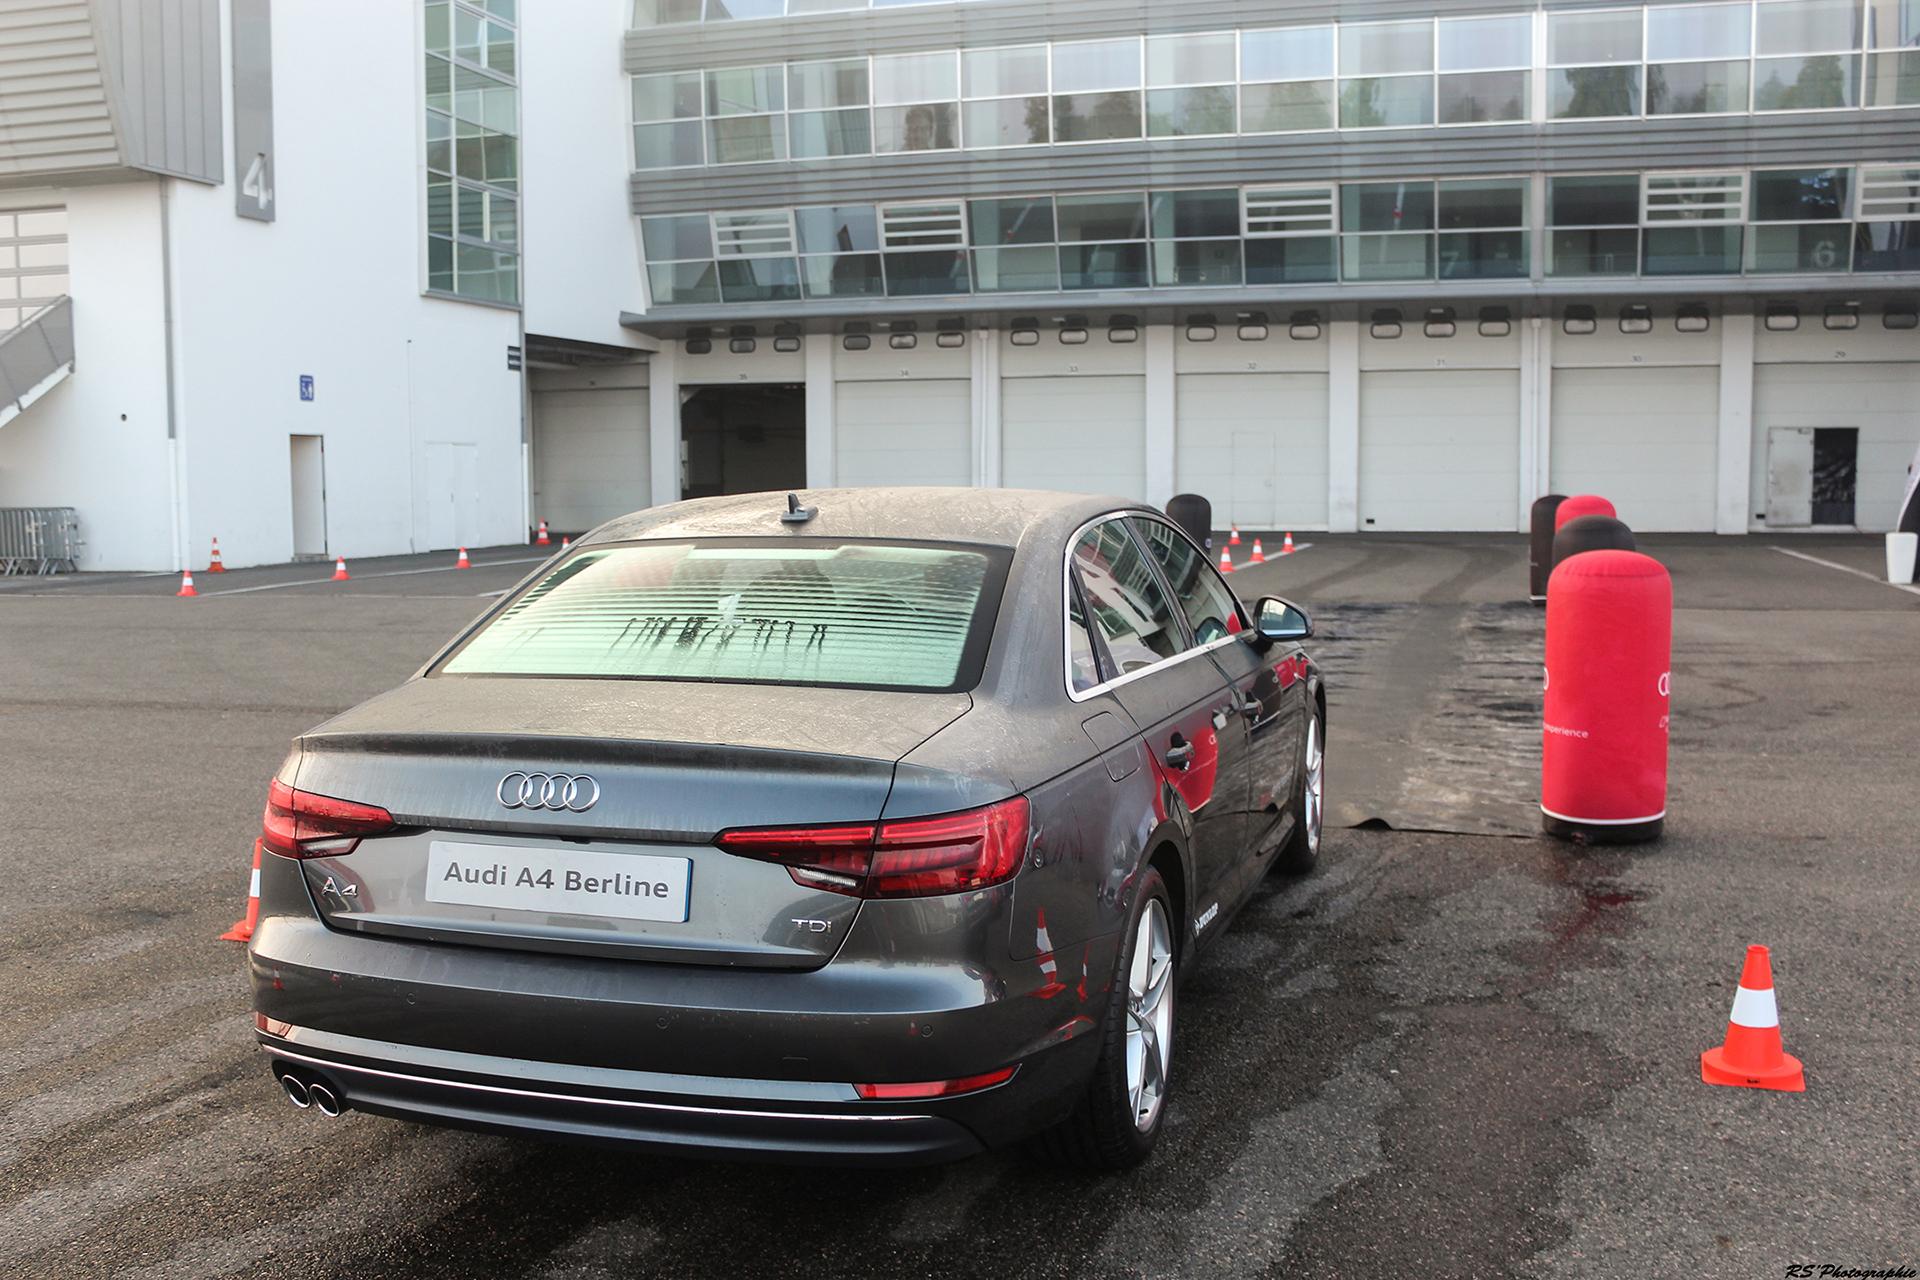 Audi A4 Berline - arrière / rear - photo Arnaud Demasier